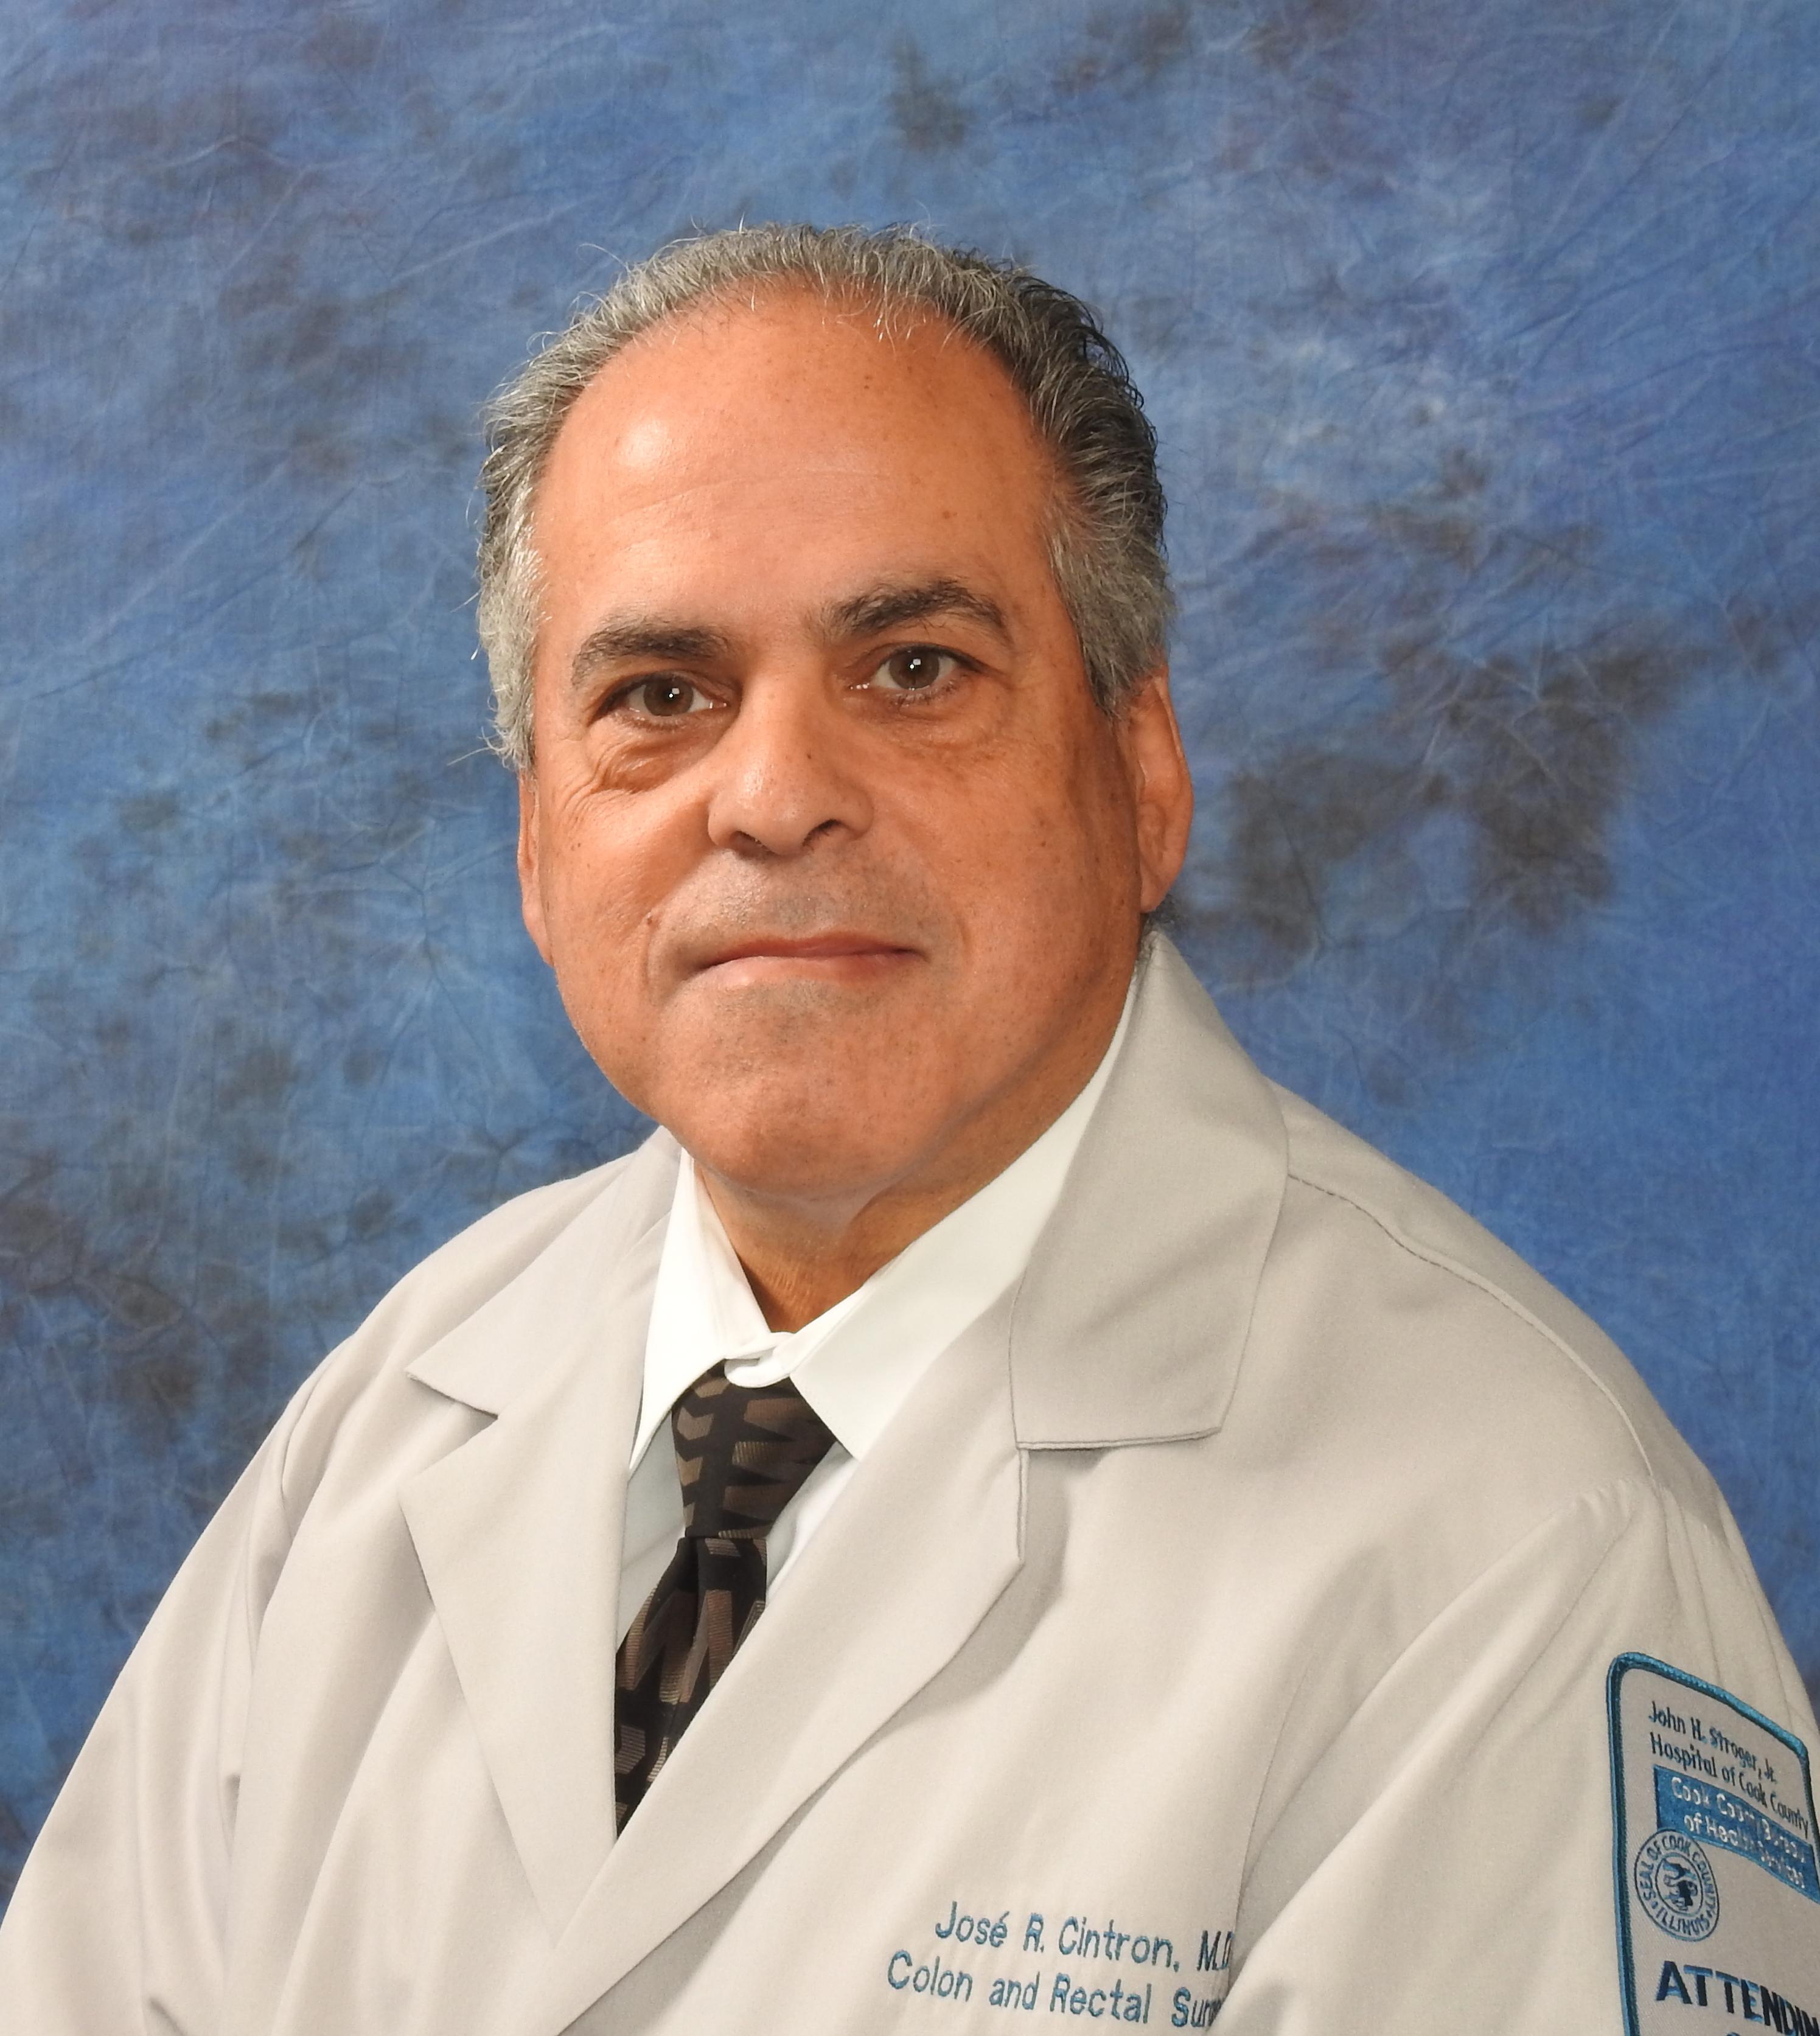 Jose R. Cintron, MD